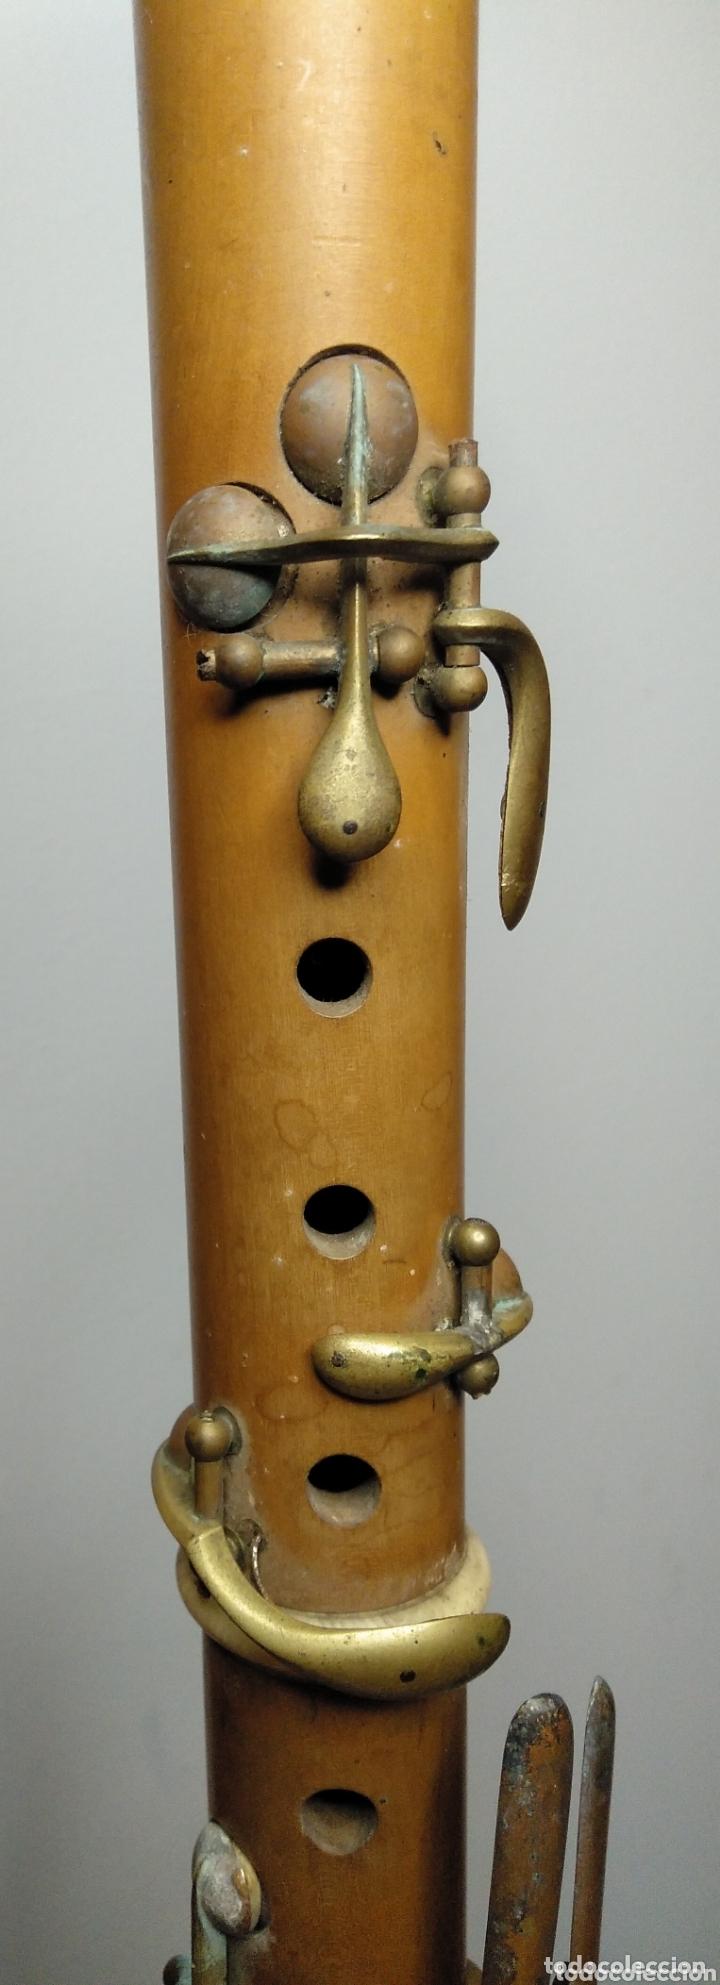 Instrumentos musicales: Clarinete Gautrot boj y marfil - Foto 5 - 172658045